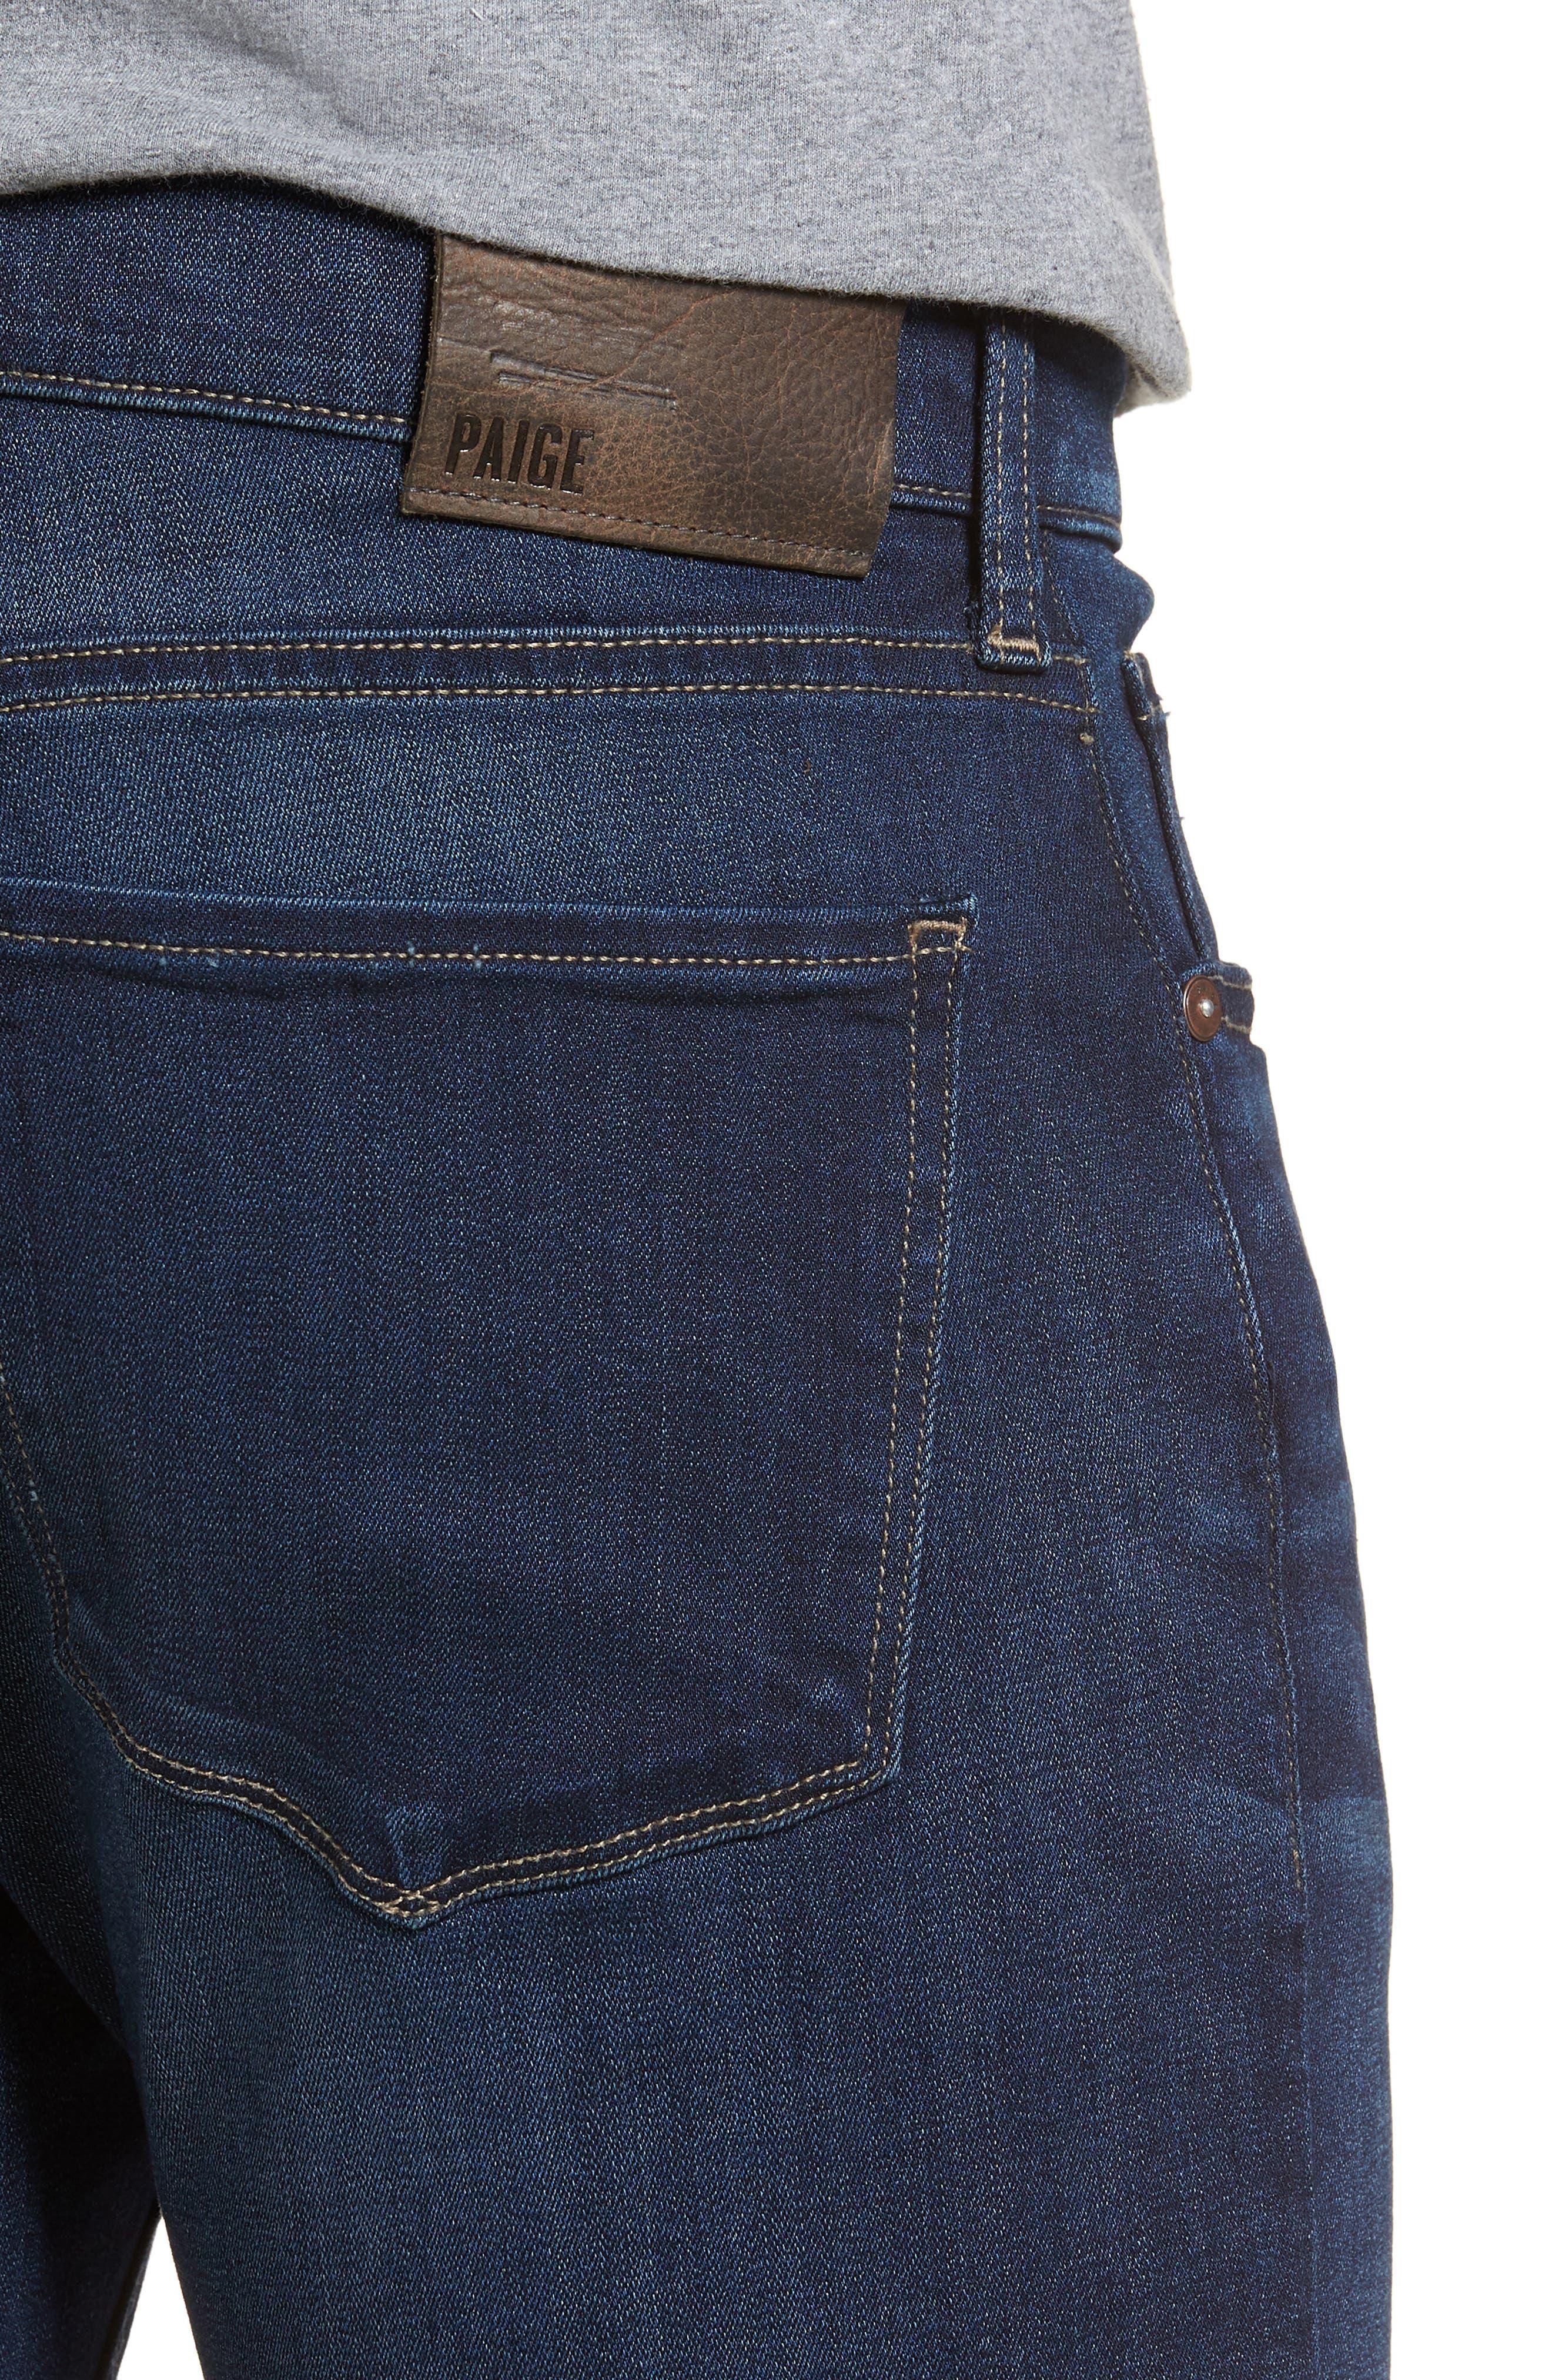 PAIGE,                             Federal Slim Straight Leg Jeans,                             Alternate thumbnail 4, color,                             400